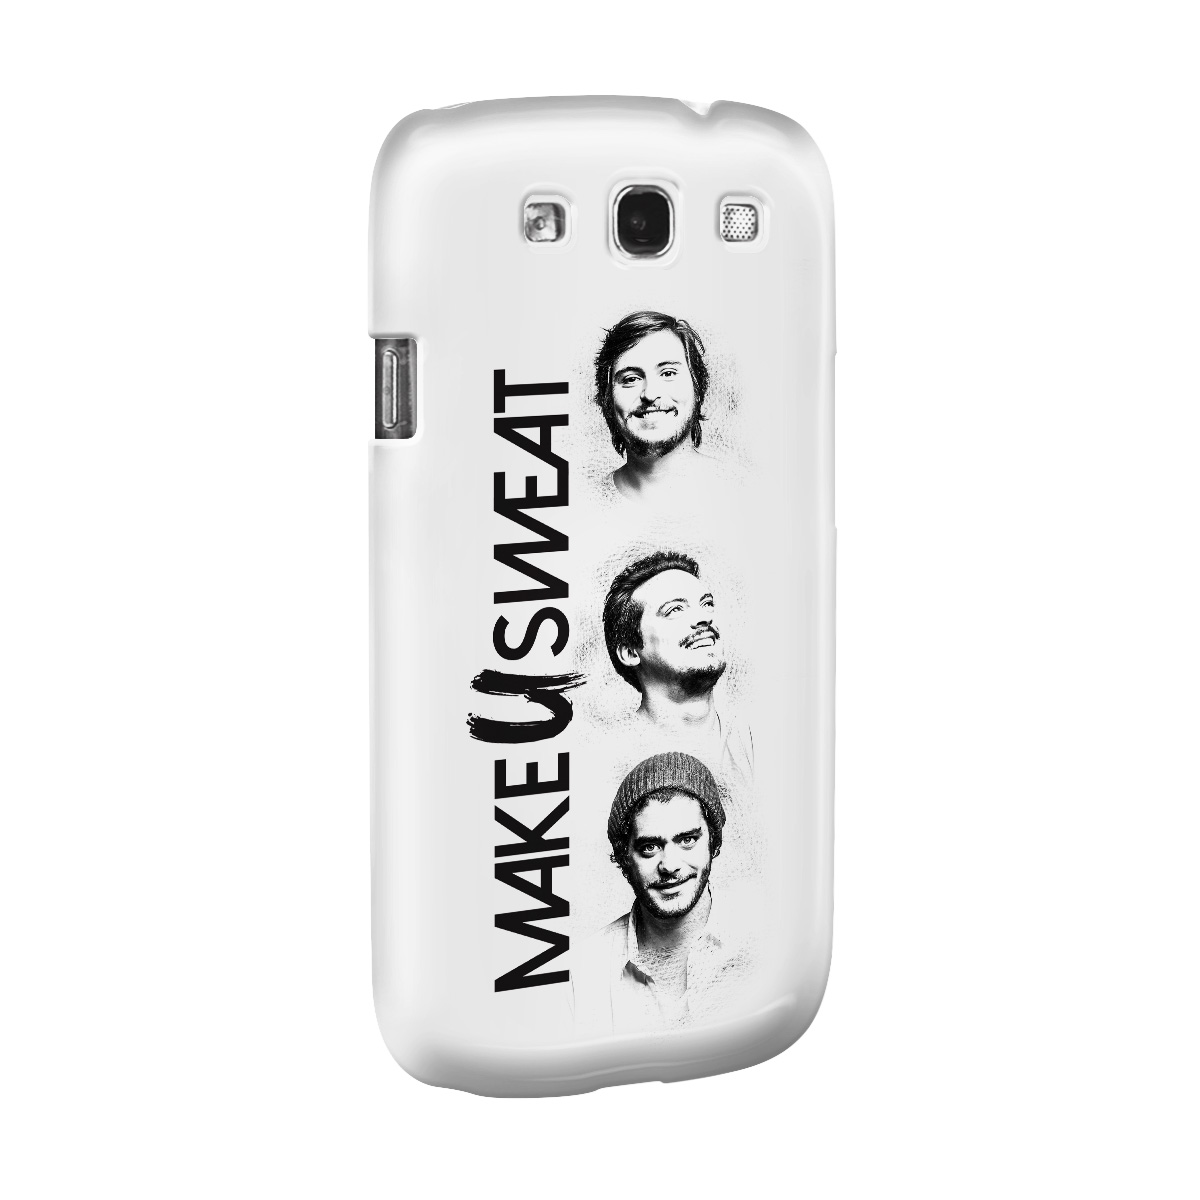 Capa para Samsung Galaxy S3 Make U Sweat Trio